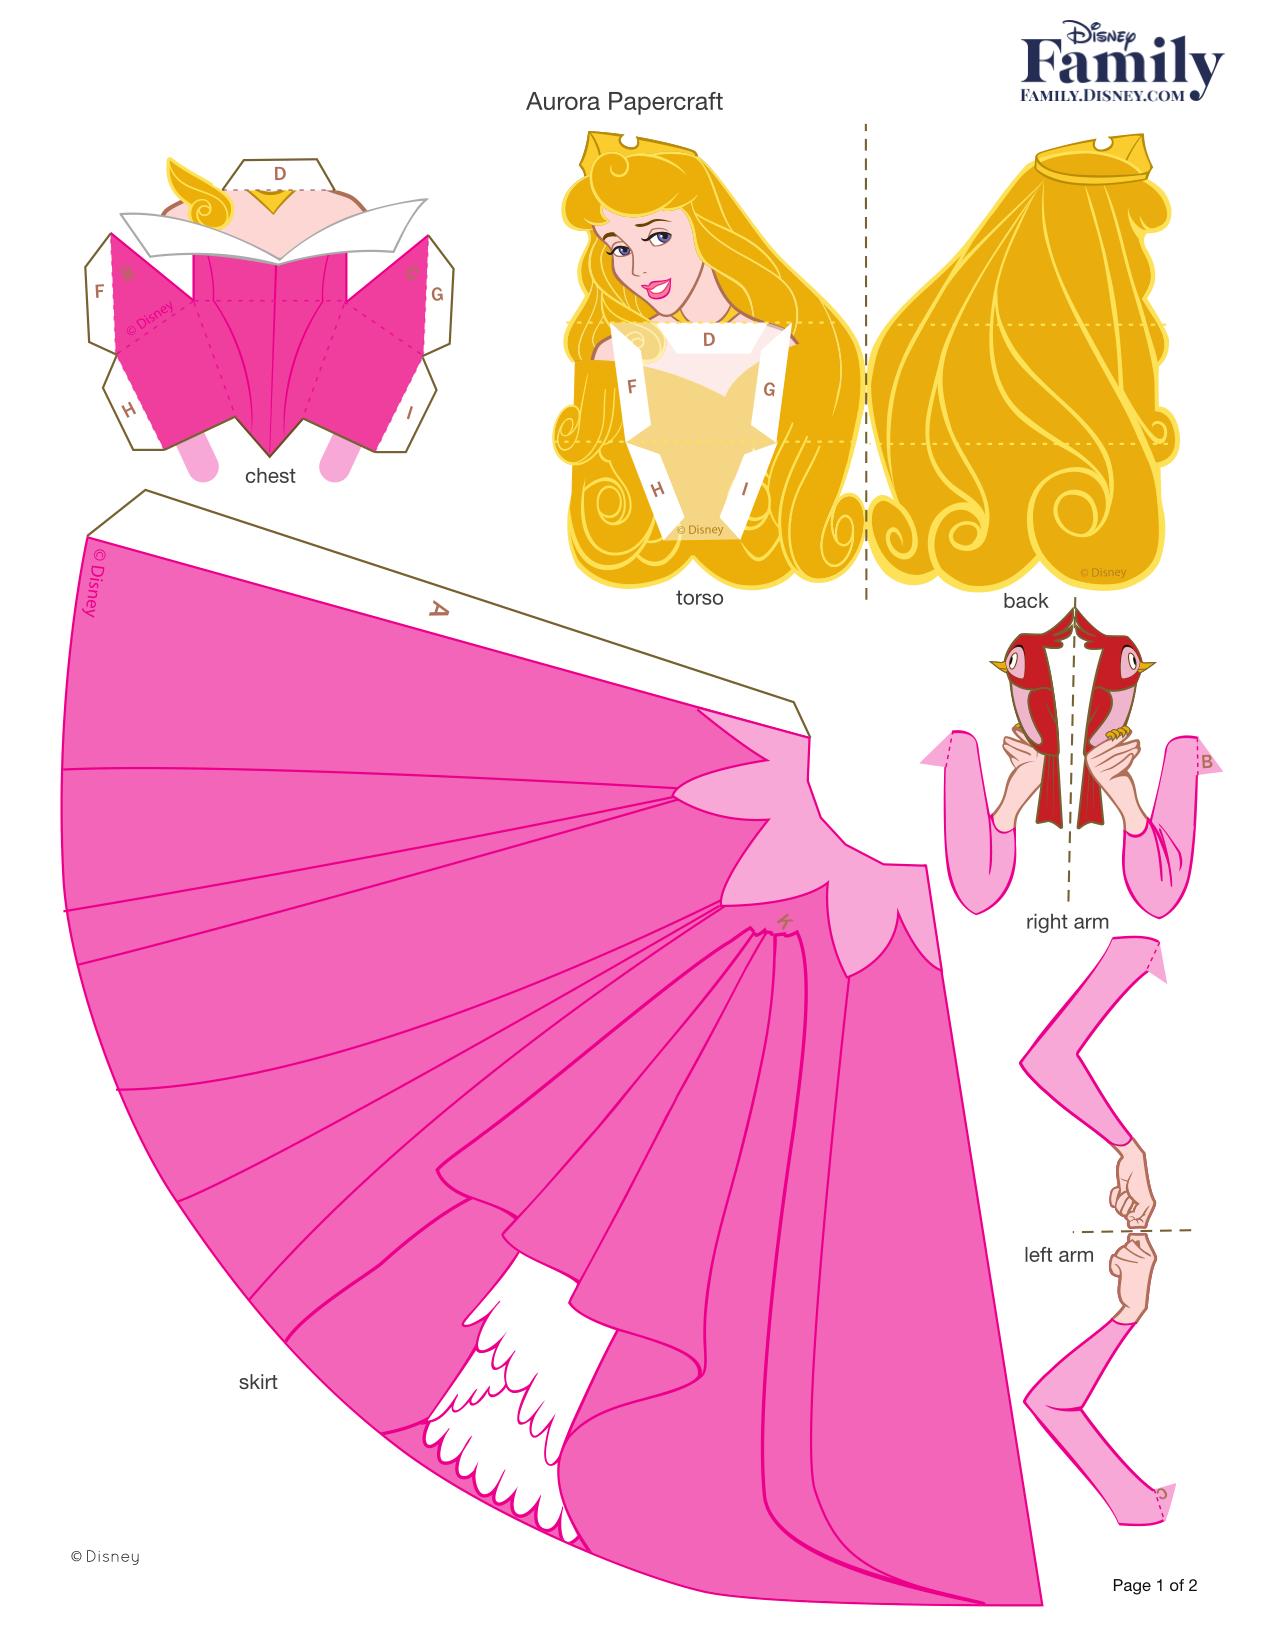 Princess Aurora Prince Party Princesa Disney Fun Crafts Craft Rooms Printable Paper Ana Rosa Papercraft Stenciling